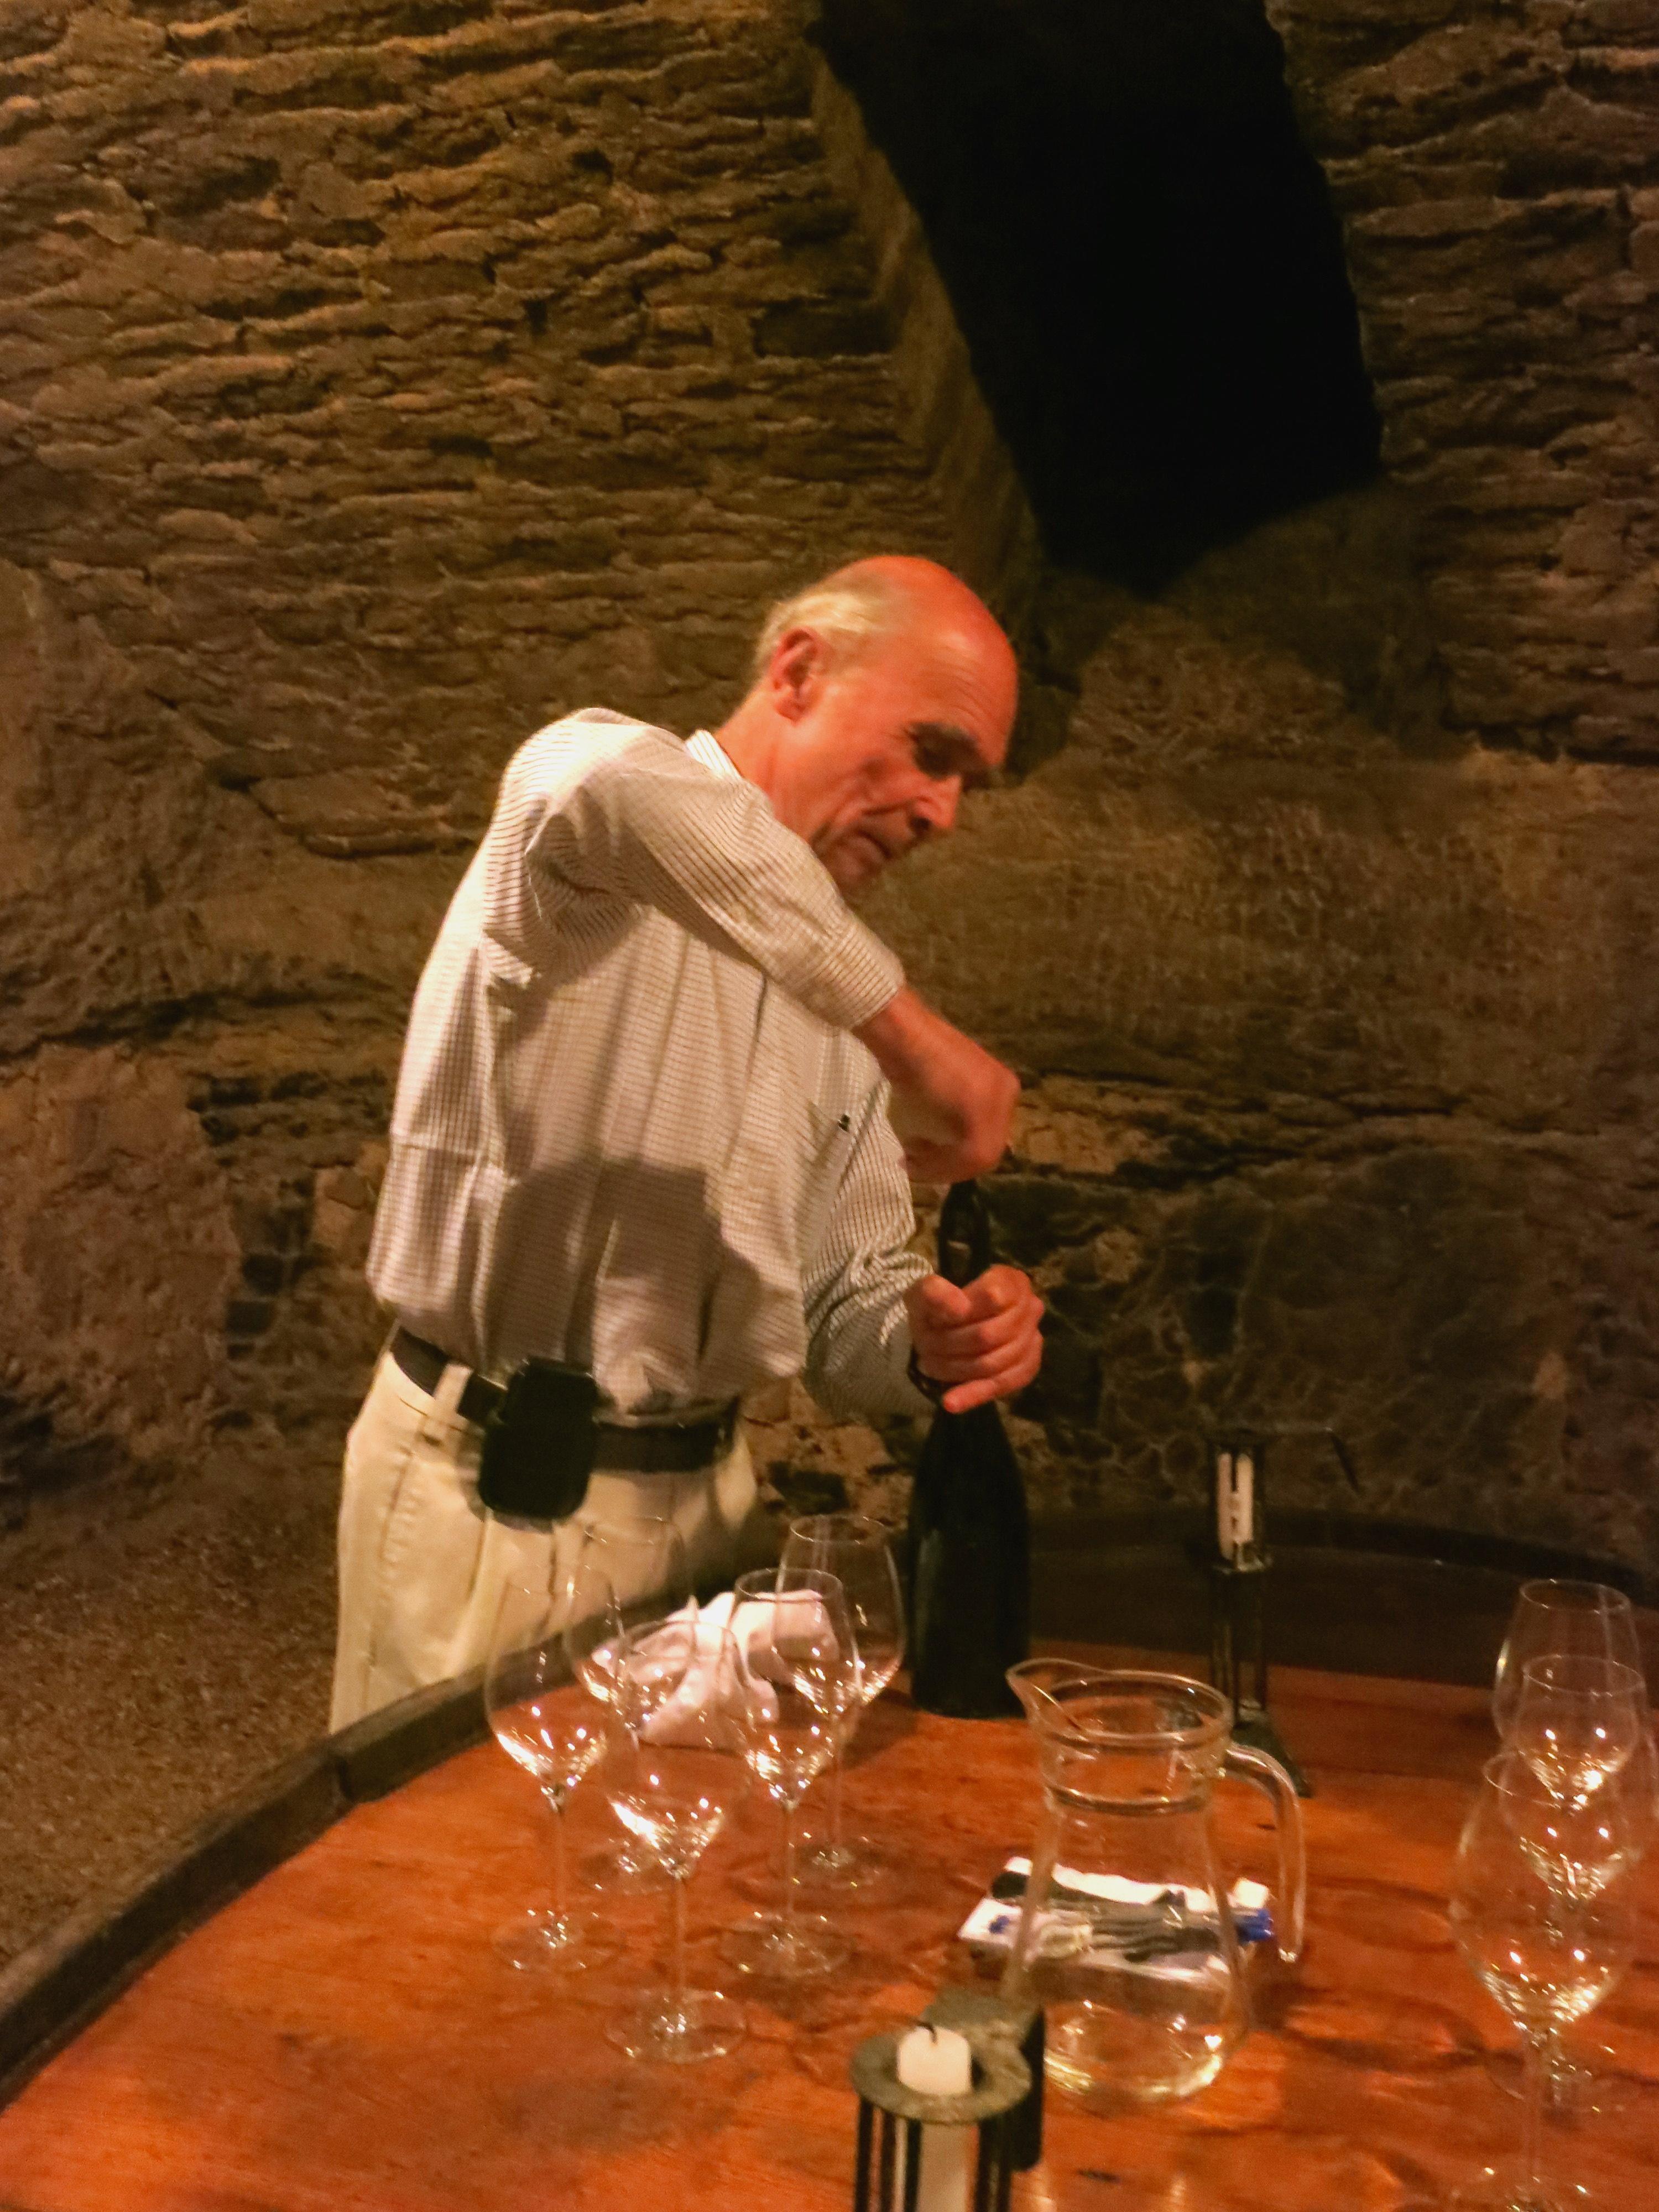 Aubert de Villaine prepares for a tasting in the cellars of the Domaine de la Romanée-Conti ©Sylvia Davis